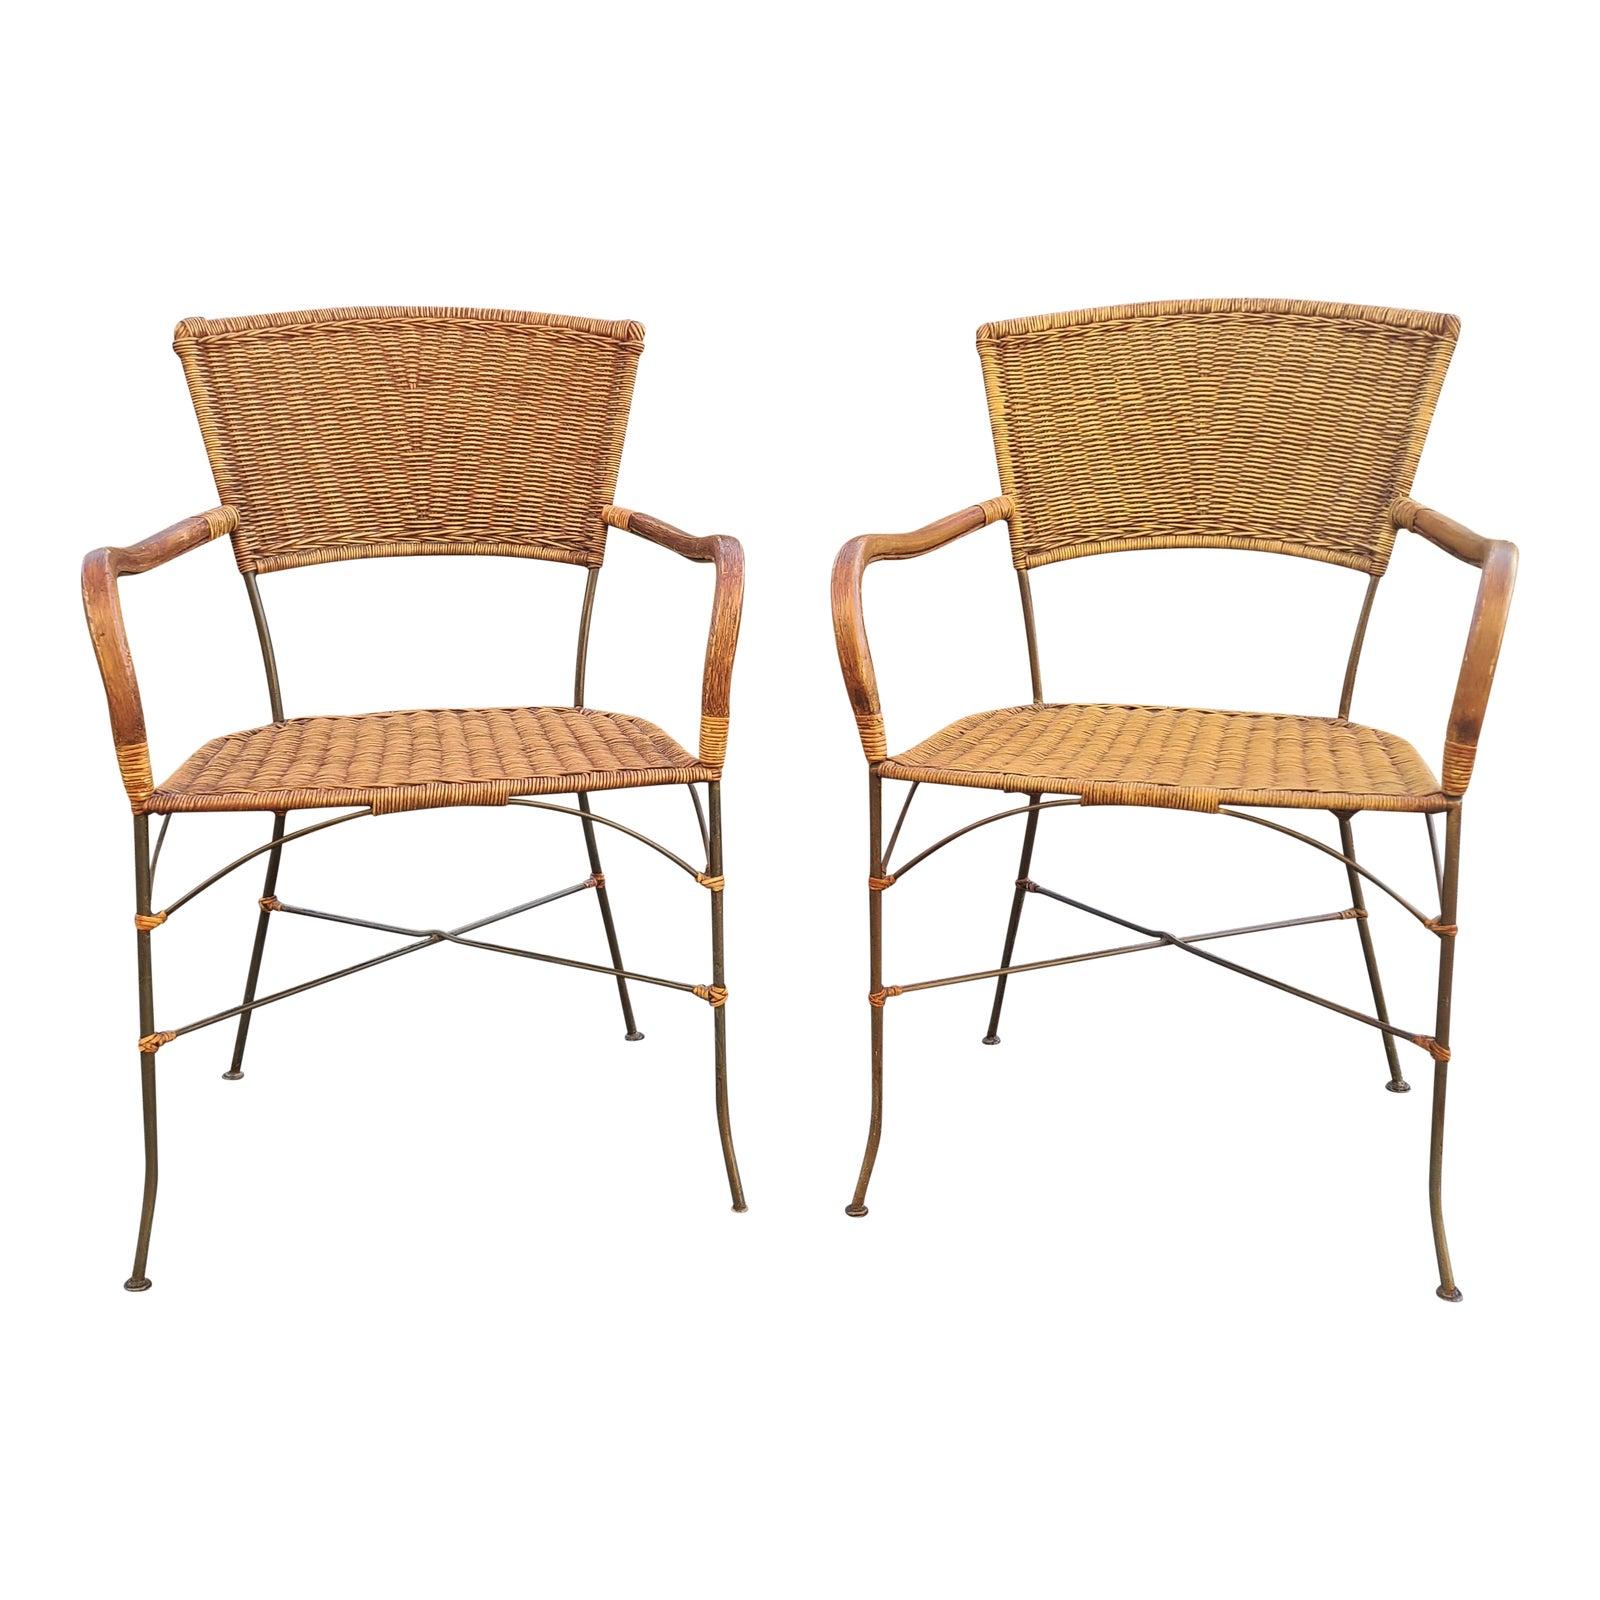 Vintage Wrought Iron Wicker Rattan Armchairs A Pair Chairish